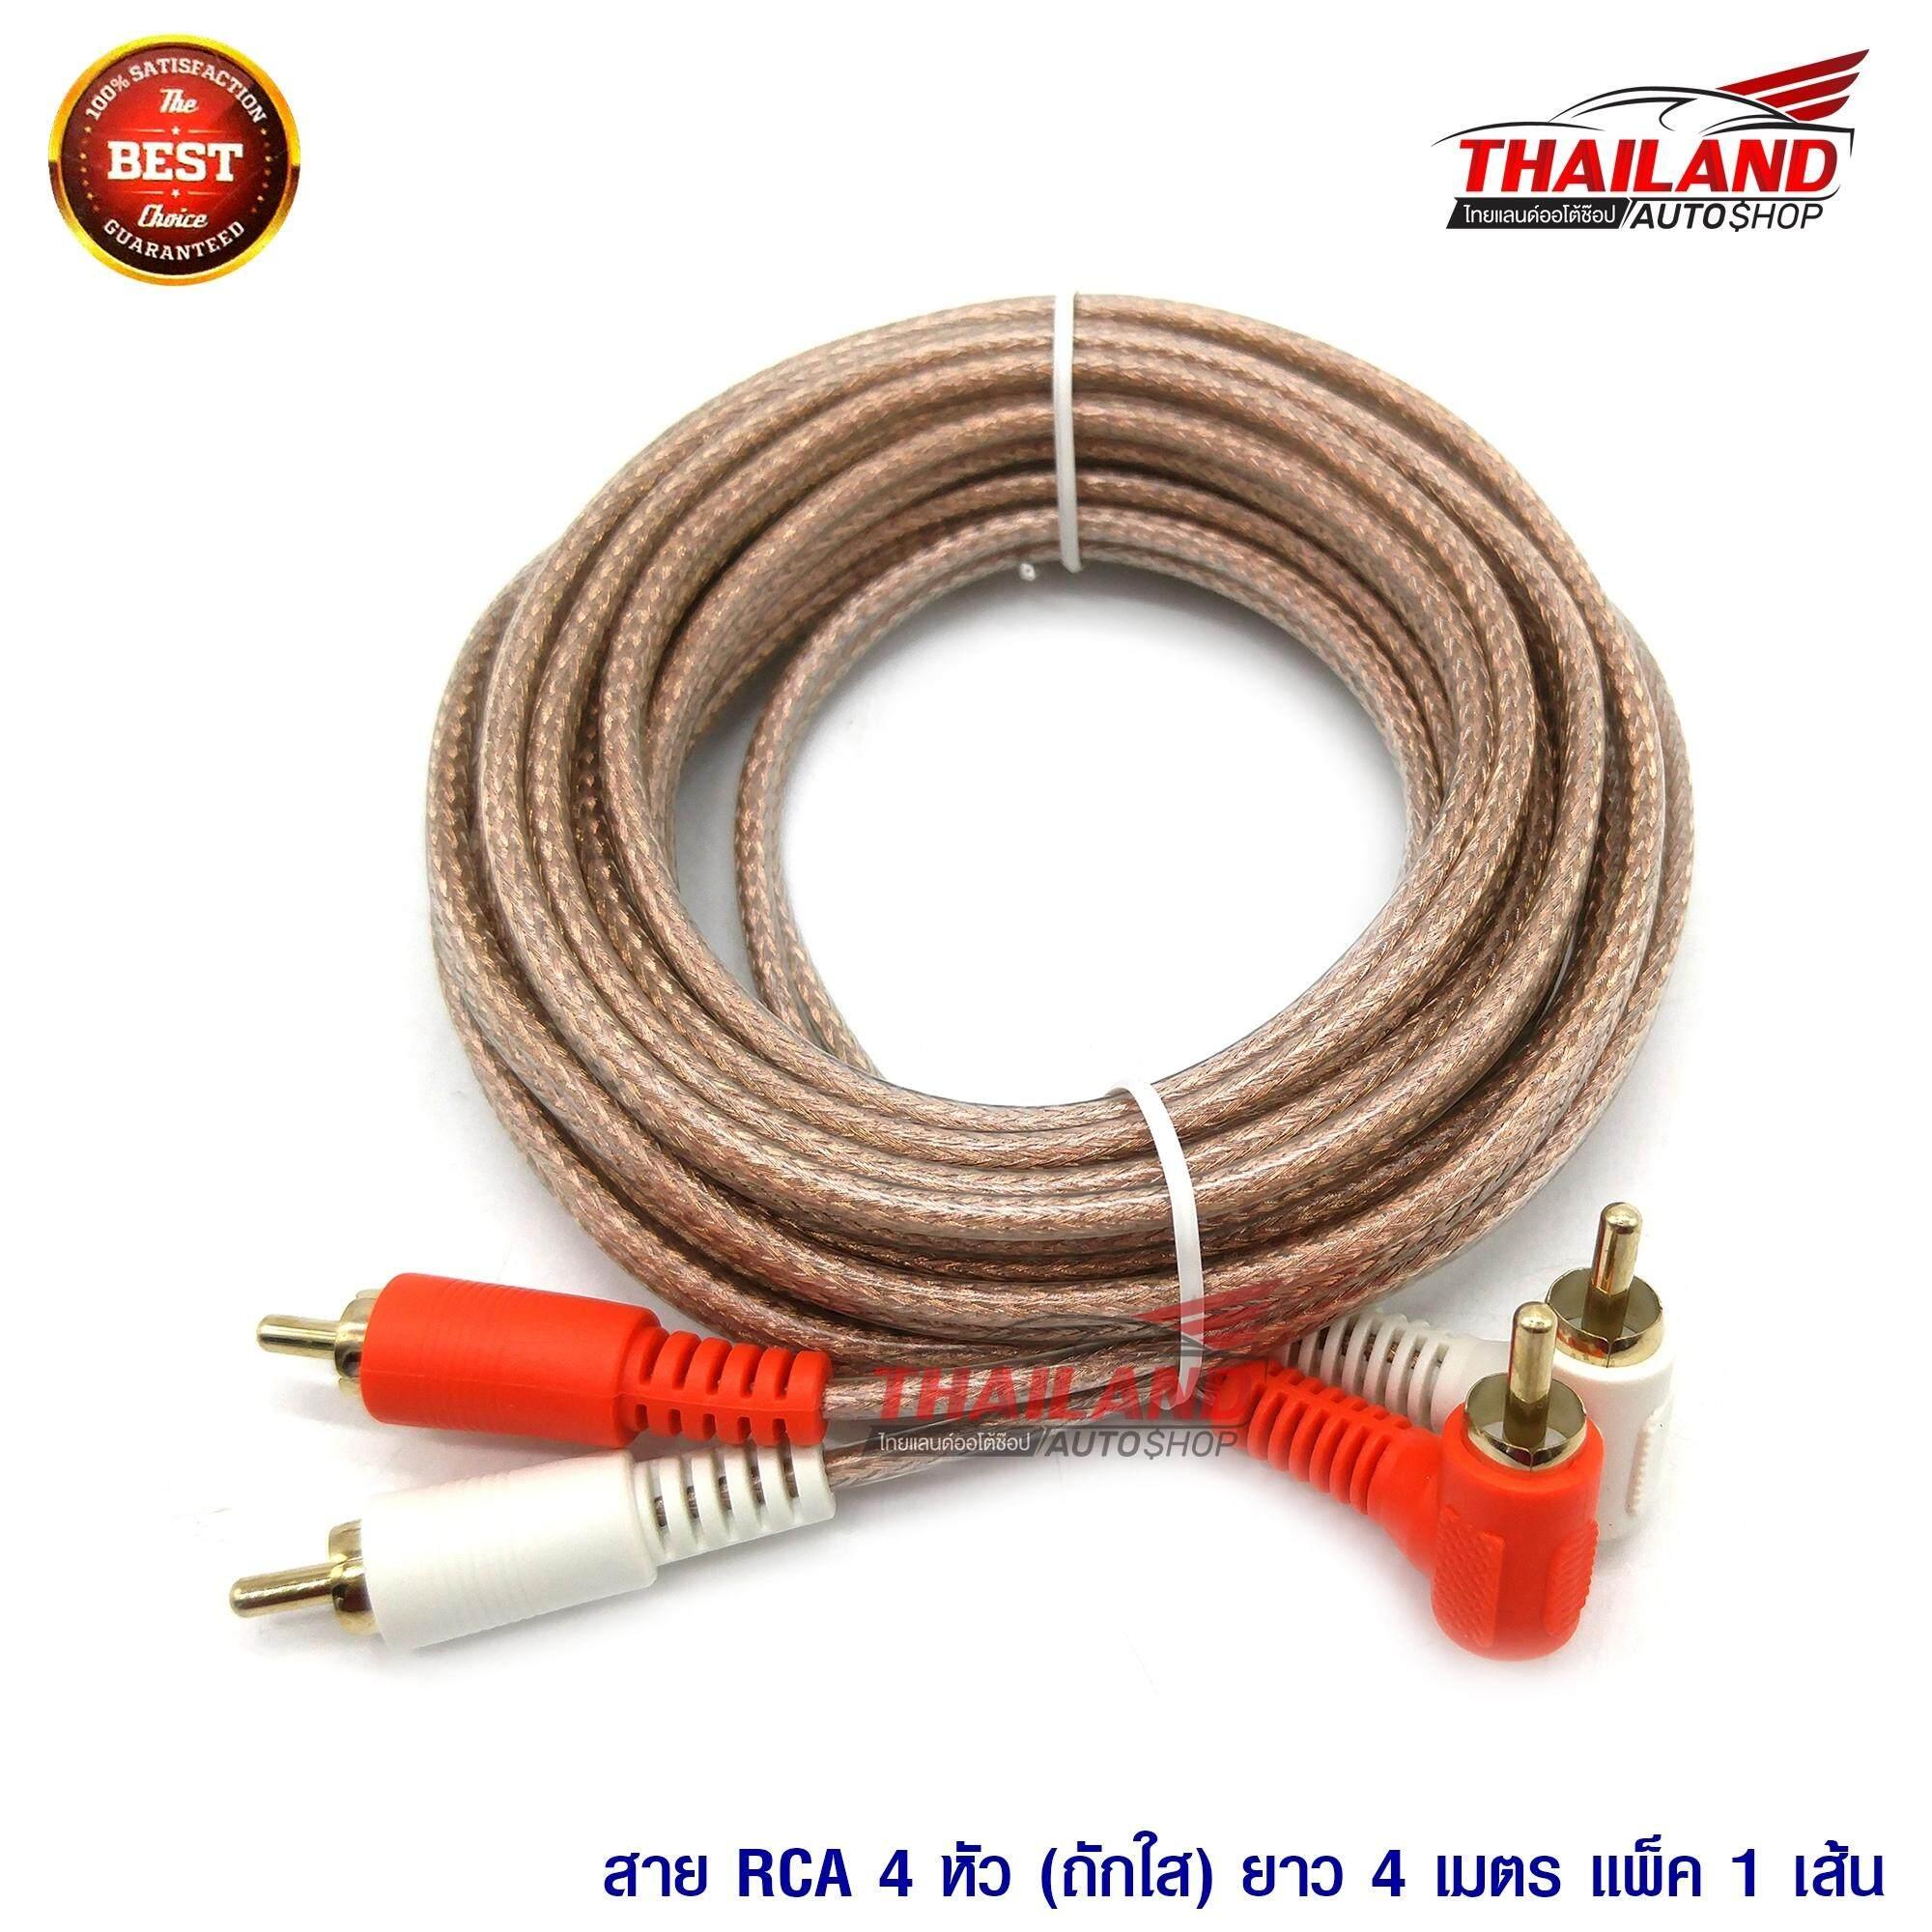 Thailand สาย Rca 4 หัว (ถักใส) 4 เมตร แพ็ค 1เส้น.